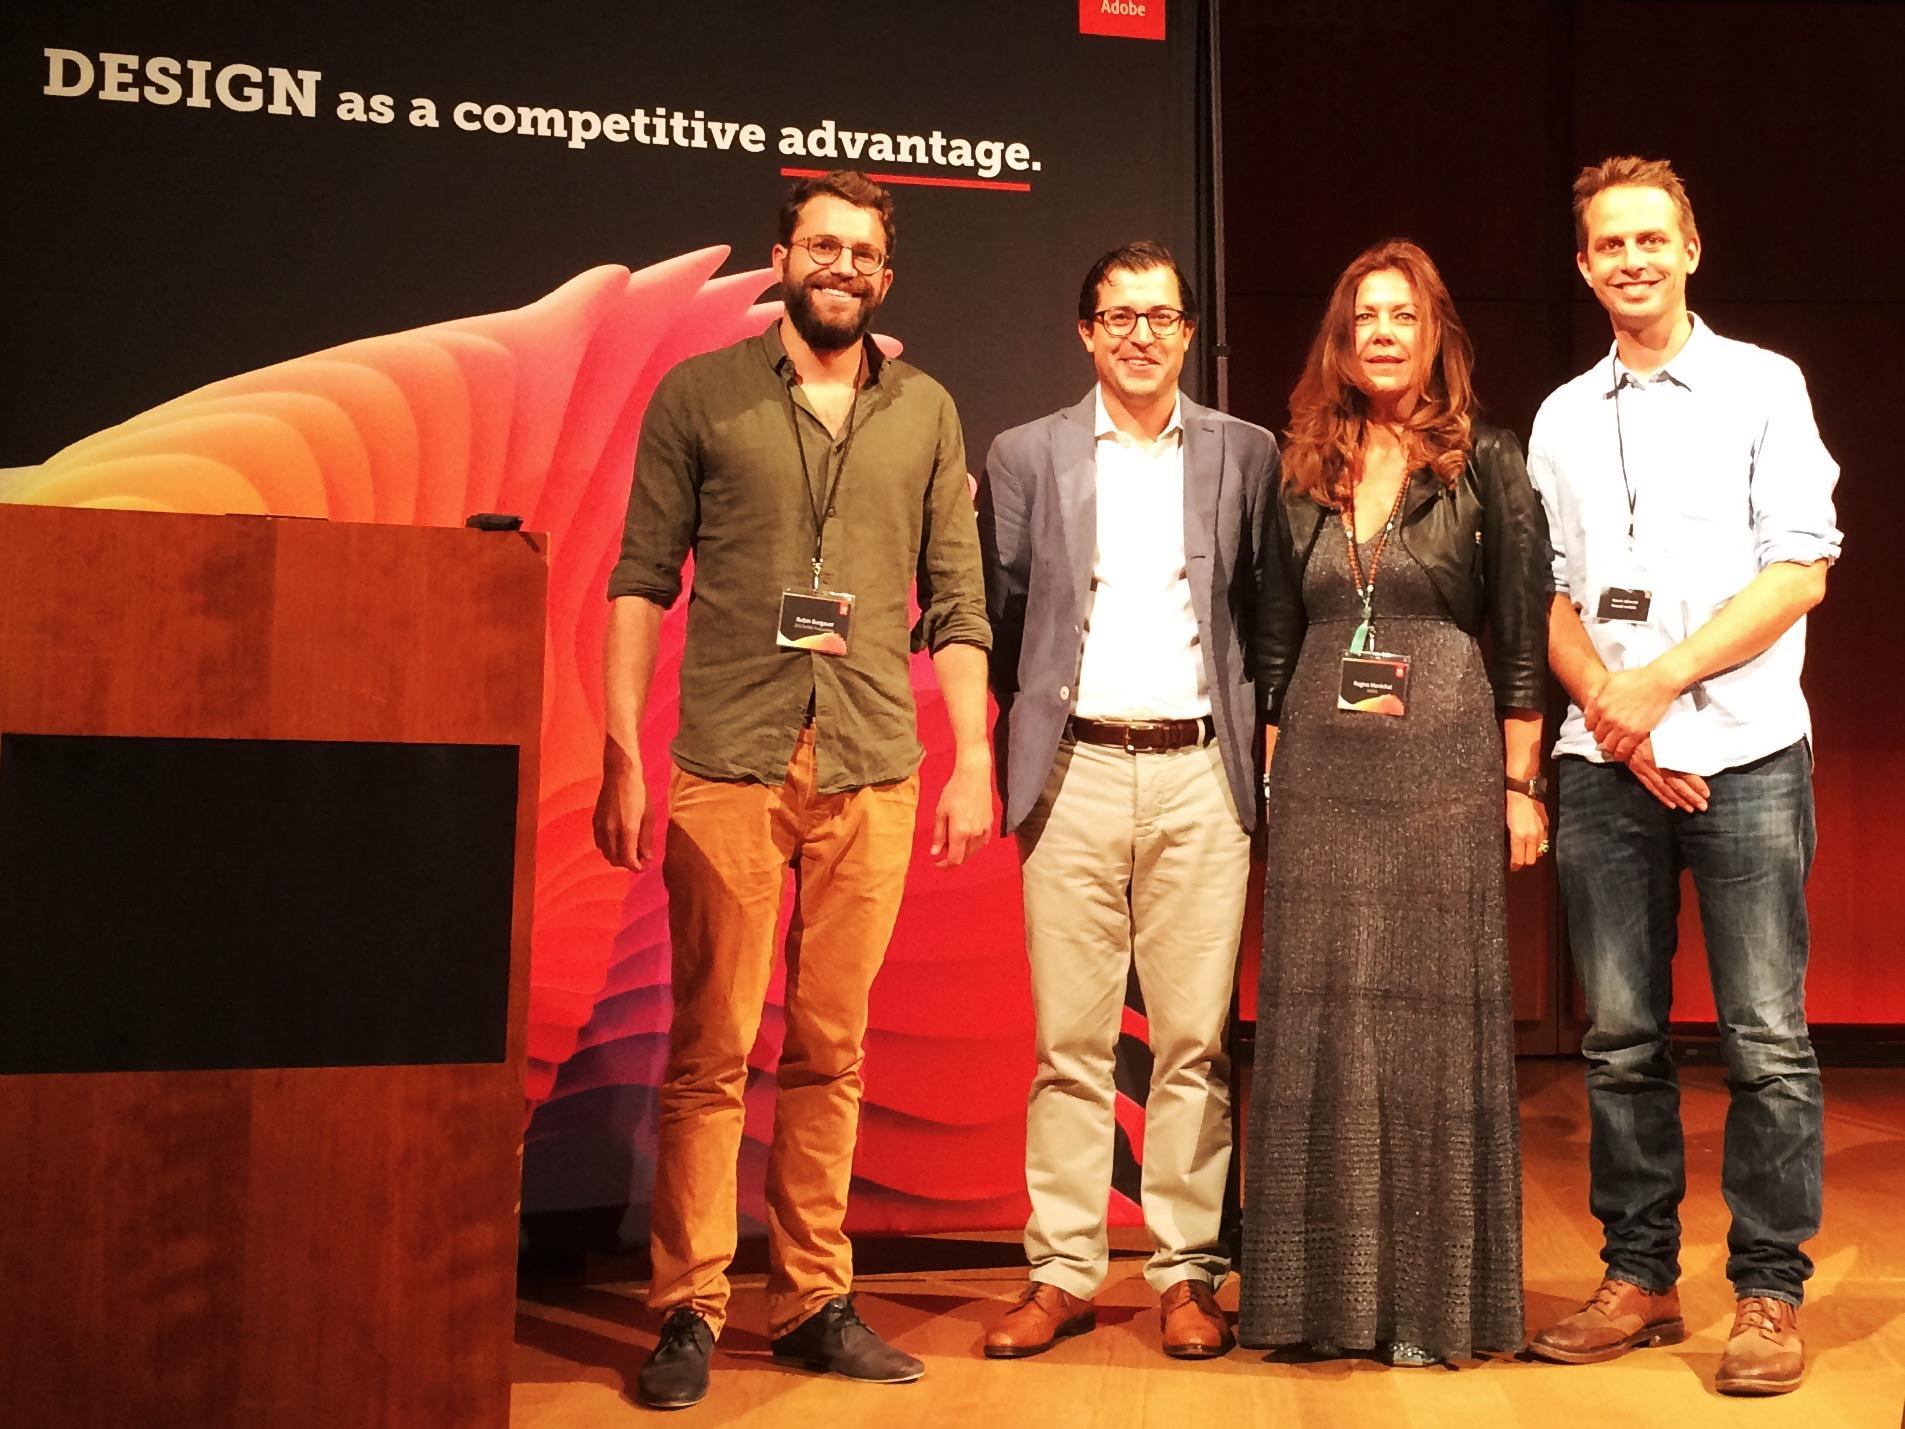 Robin Burgauer, Head of Creation DOCMINE; Nick Bogaty, Head of Digital Publishing Adobe; Regina Maréchal, Head of Corporate Publishing SWISS, Patrick M. Müller, Managing Director DOCMINE